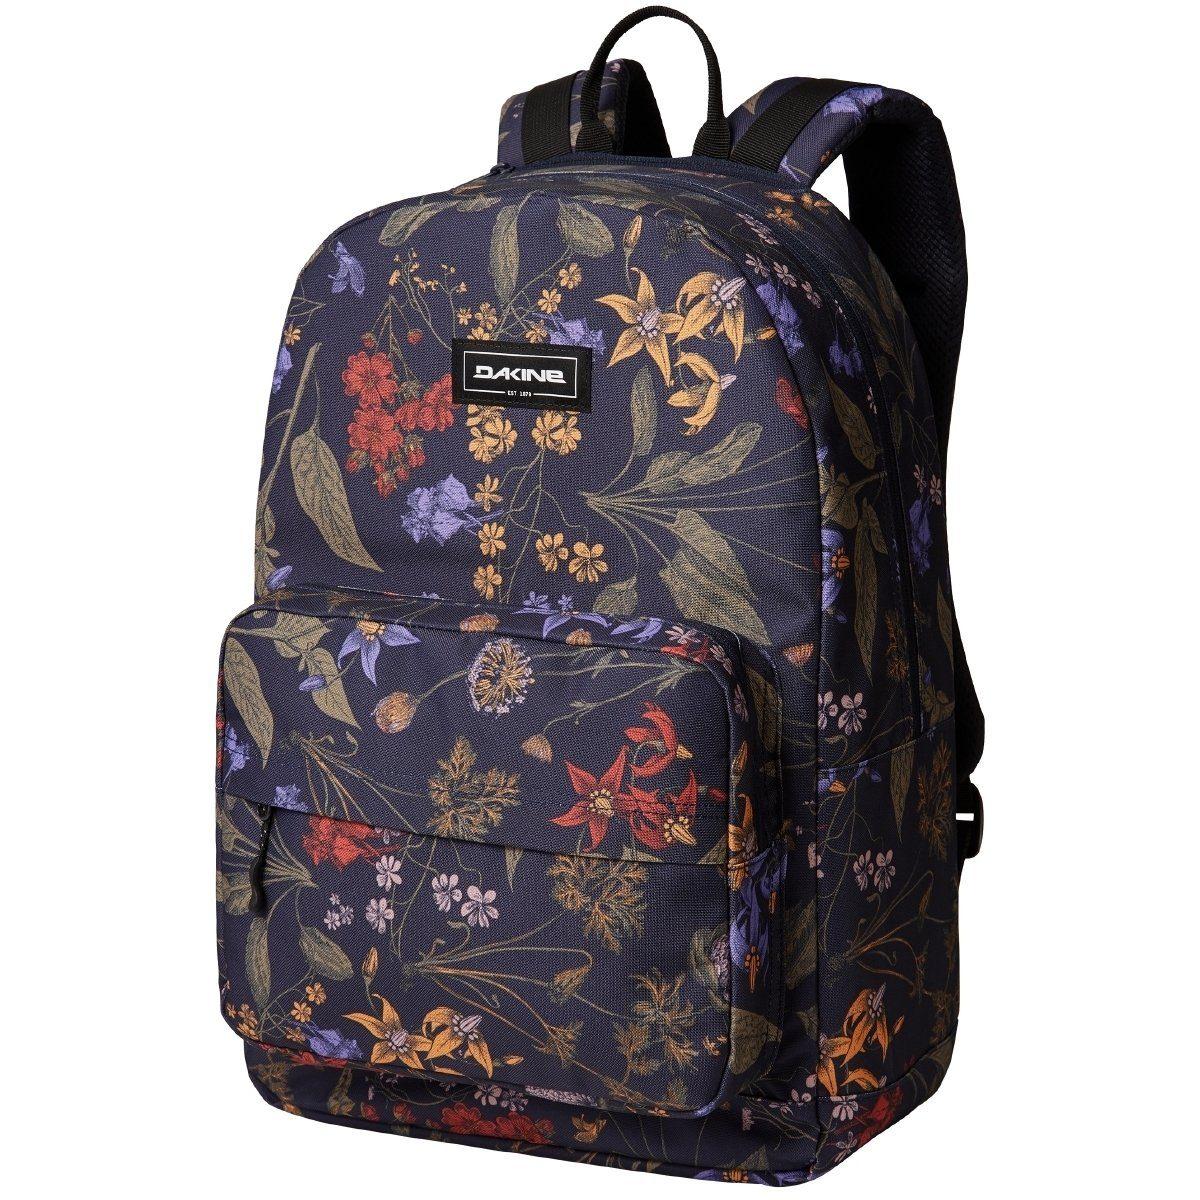 Kaufen Tagesrucksack Dakine Online »365 Pack 30l« thQBrdCxs